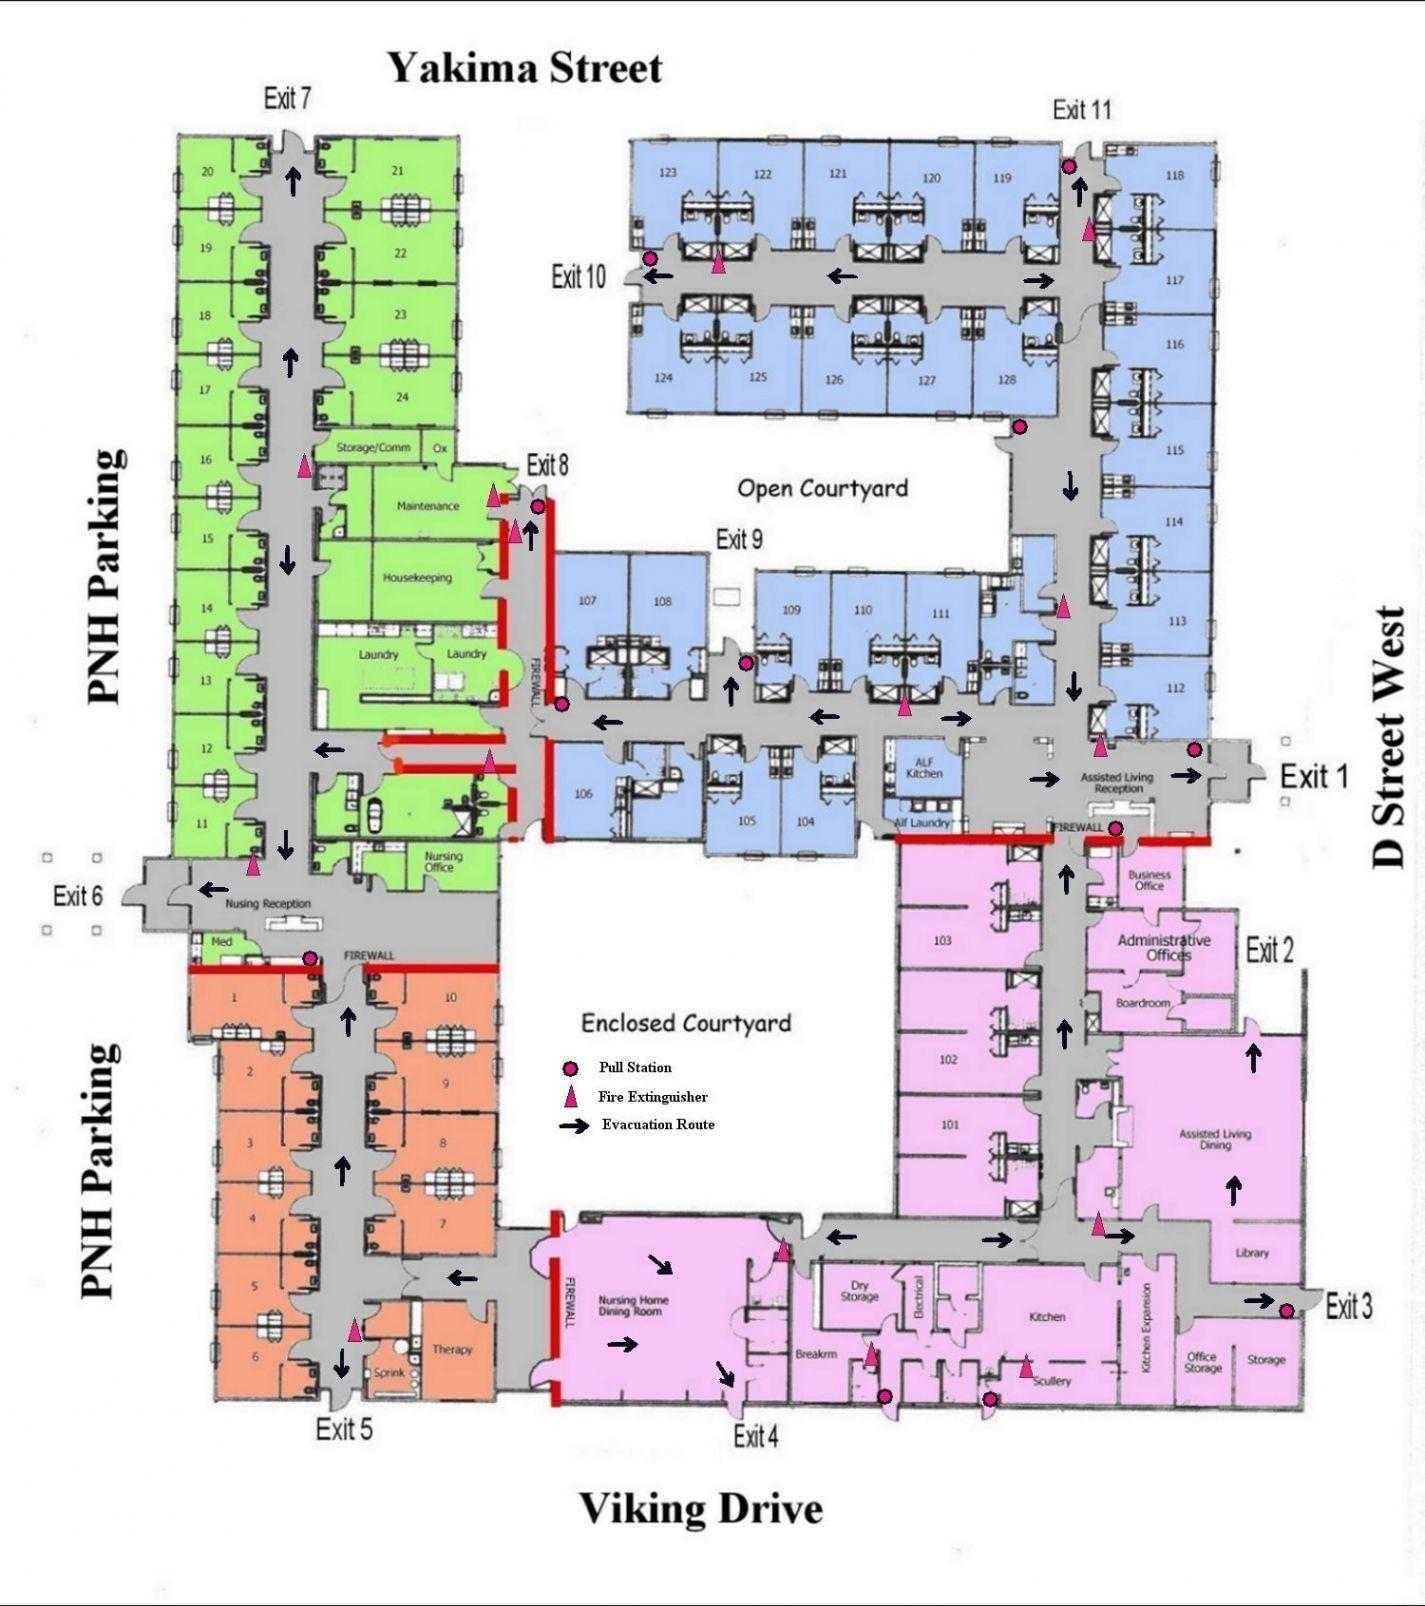 Hospital floor plan image by marla frazer on Courtyard